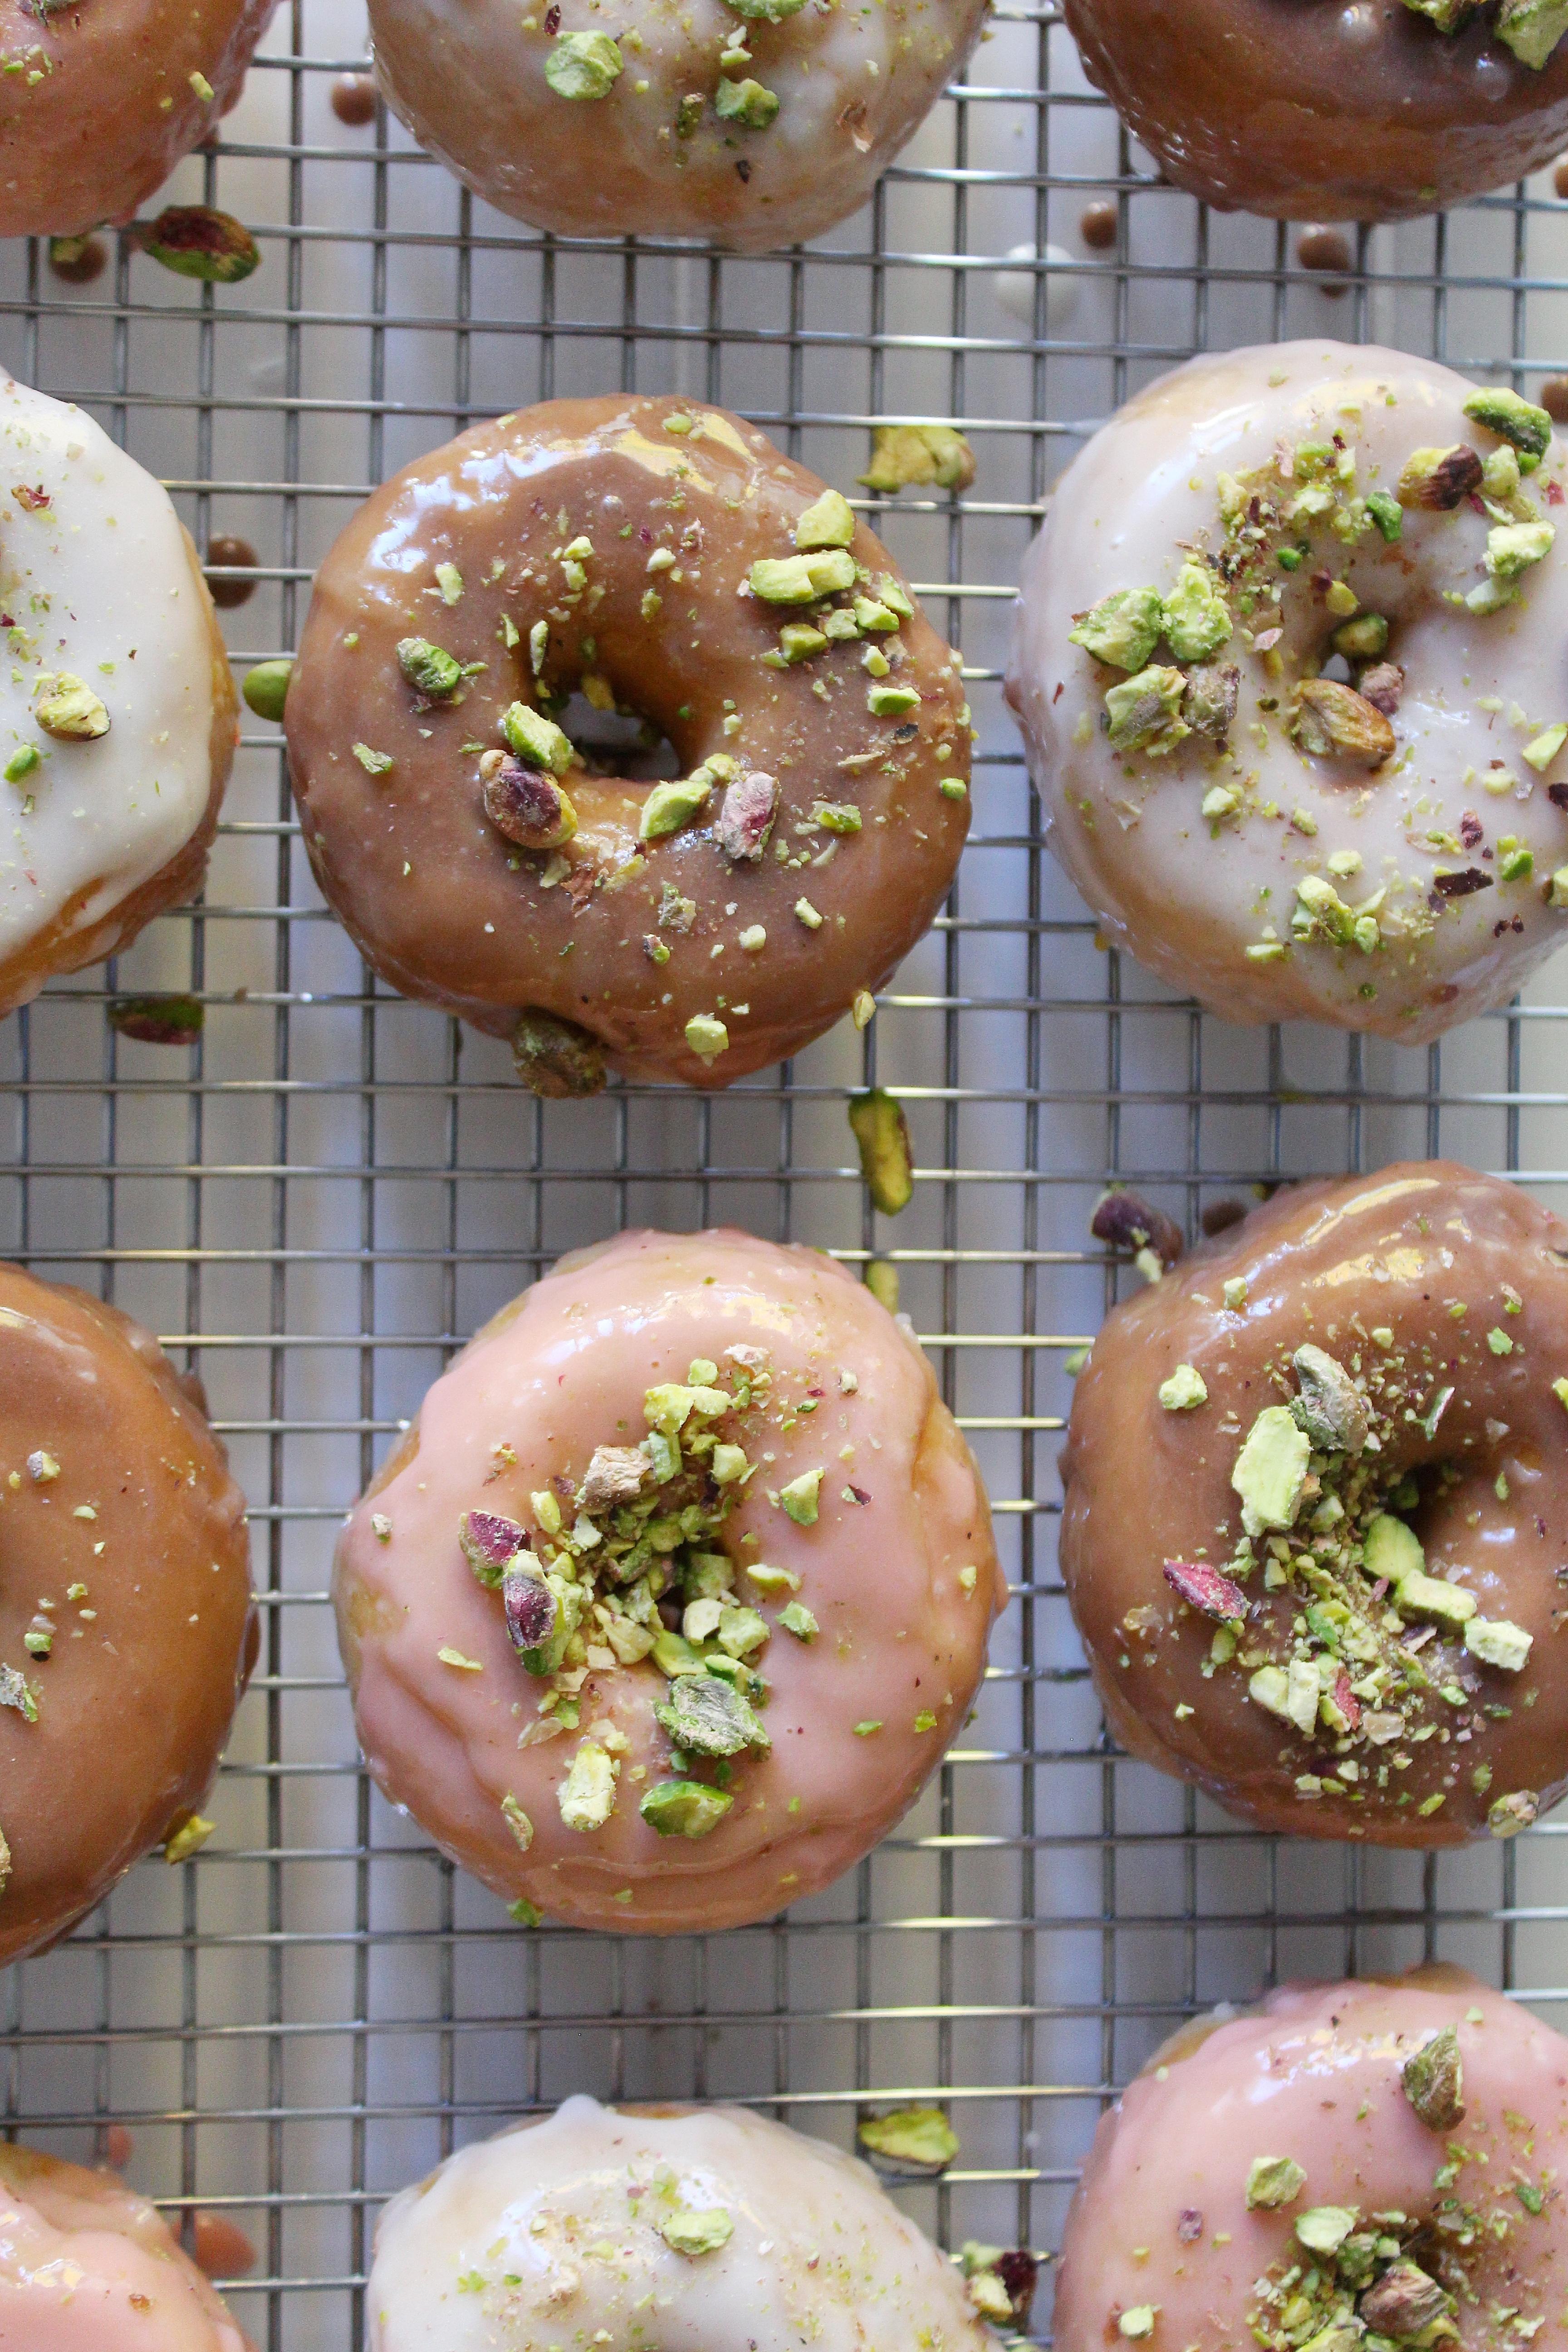 http://www.bedbathandbeyond.ca/store/product/wilton-reg-6-cavity-doughnut-pan/1017631802?Keyword=donut+pan